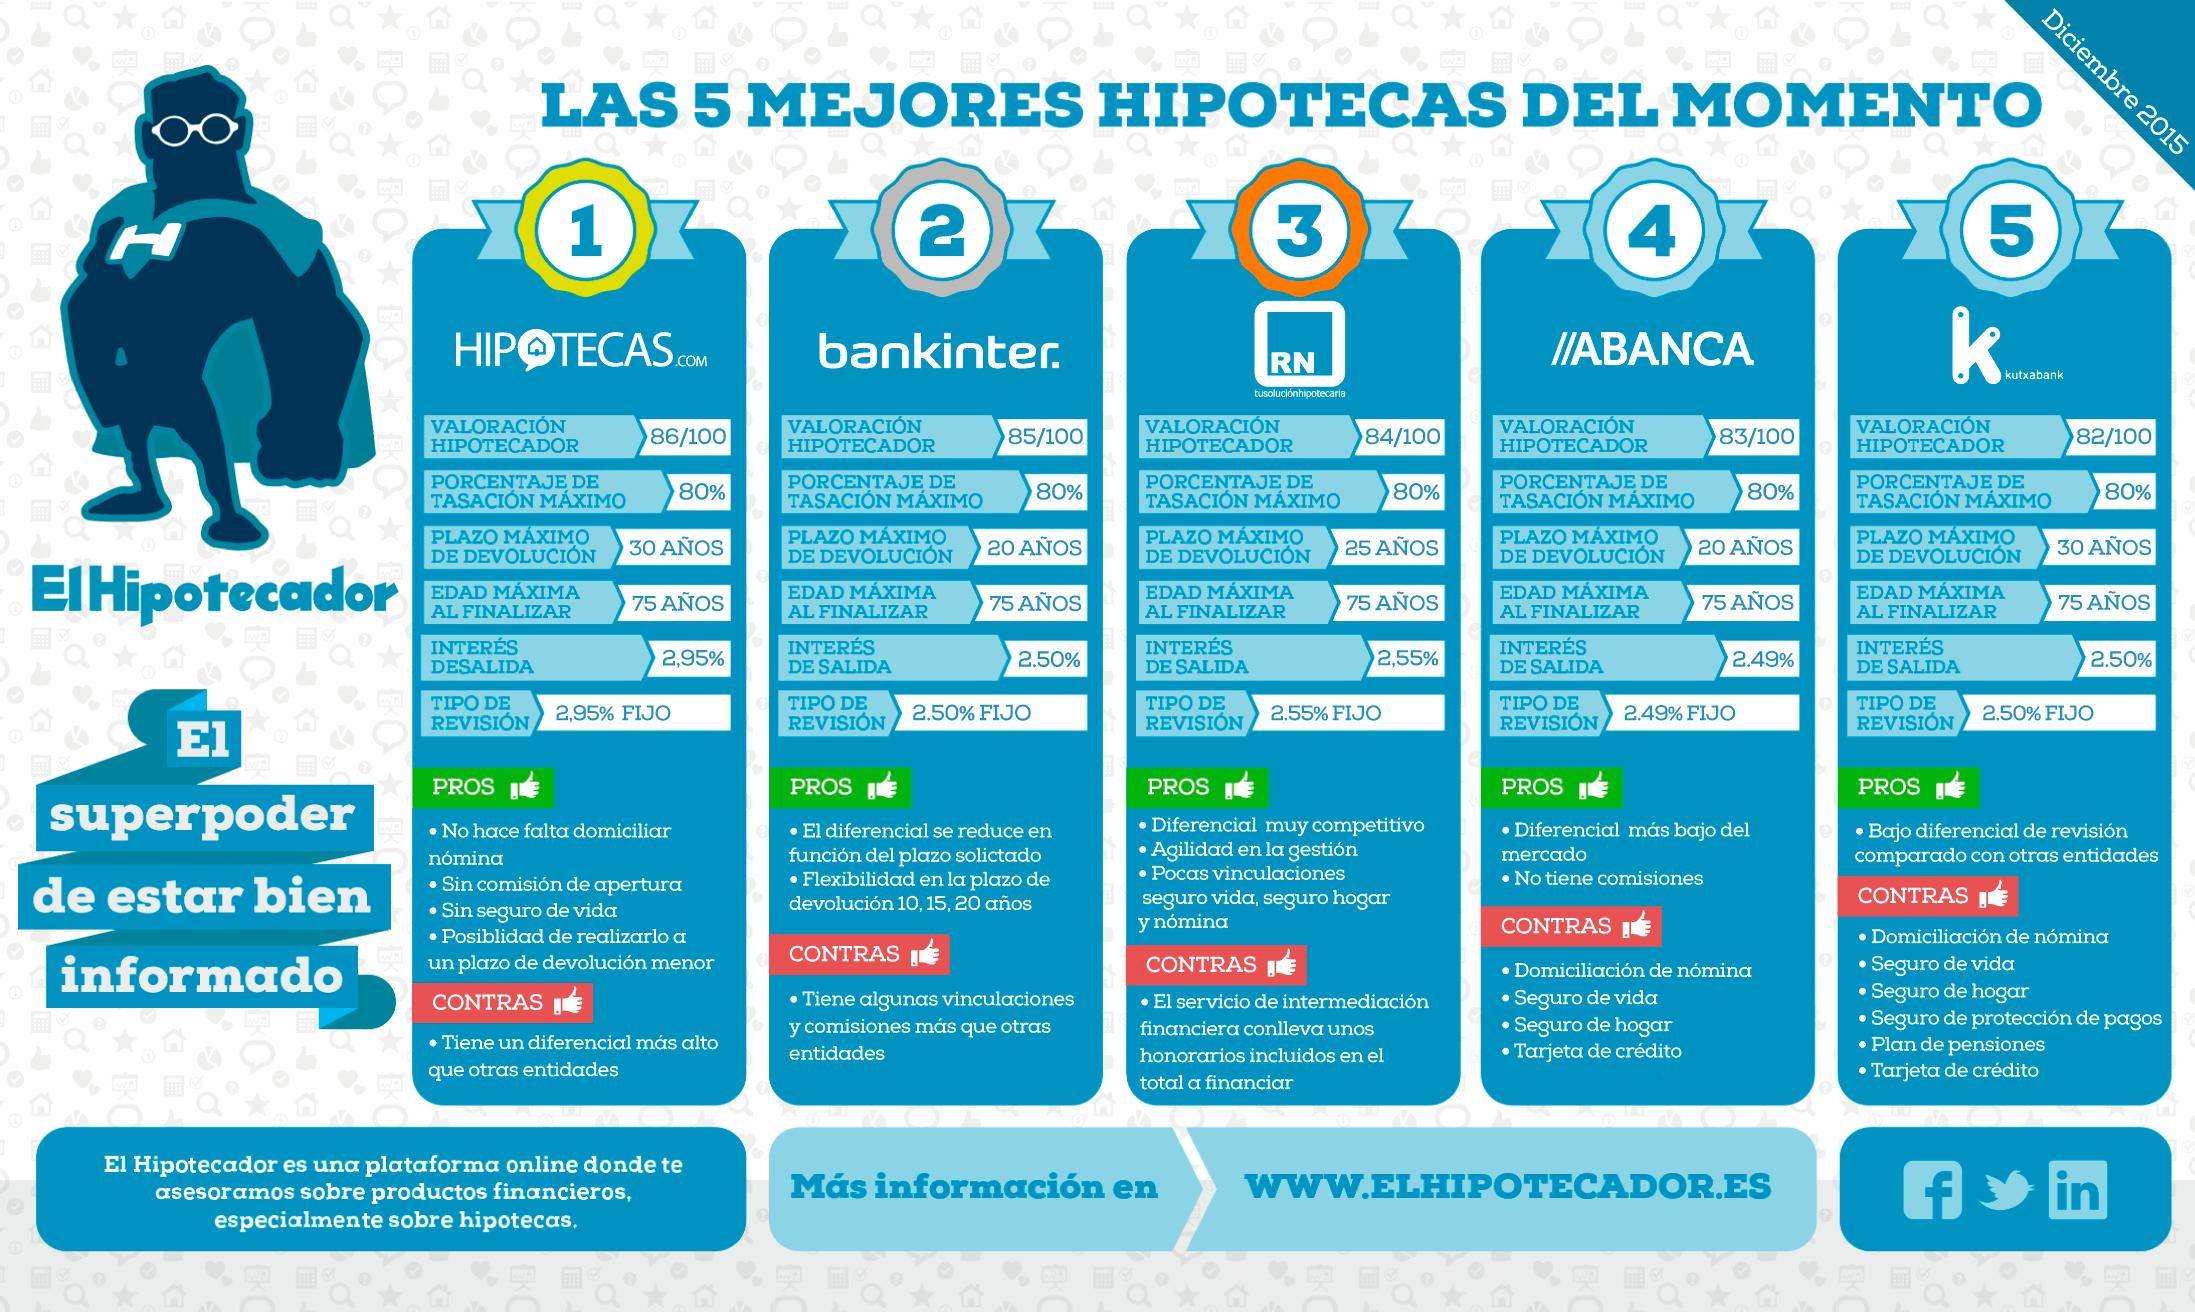 Infografia-Mejores-Hipotecas-Fija-(El-Hipotecador)---diciembre-2015-4